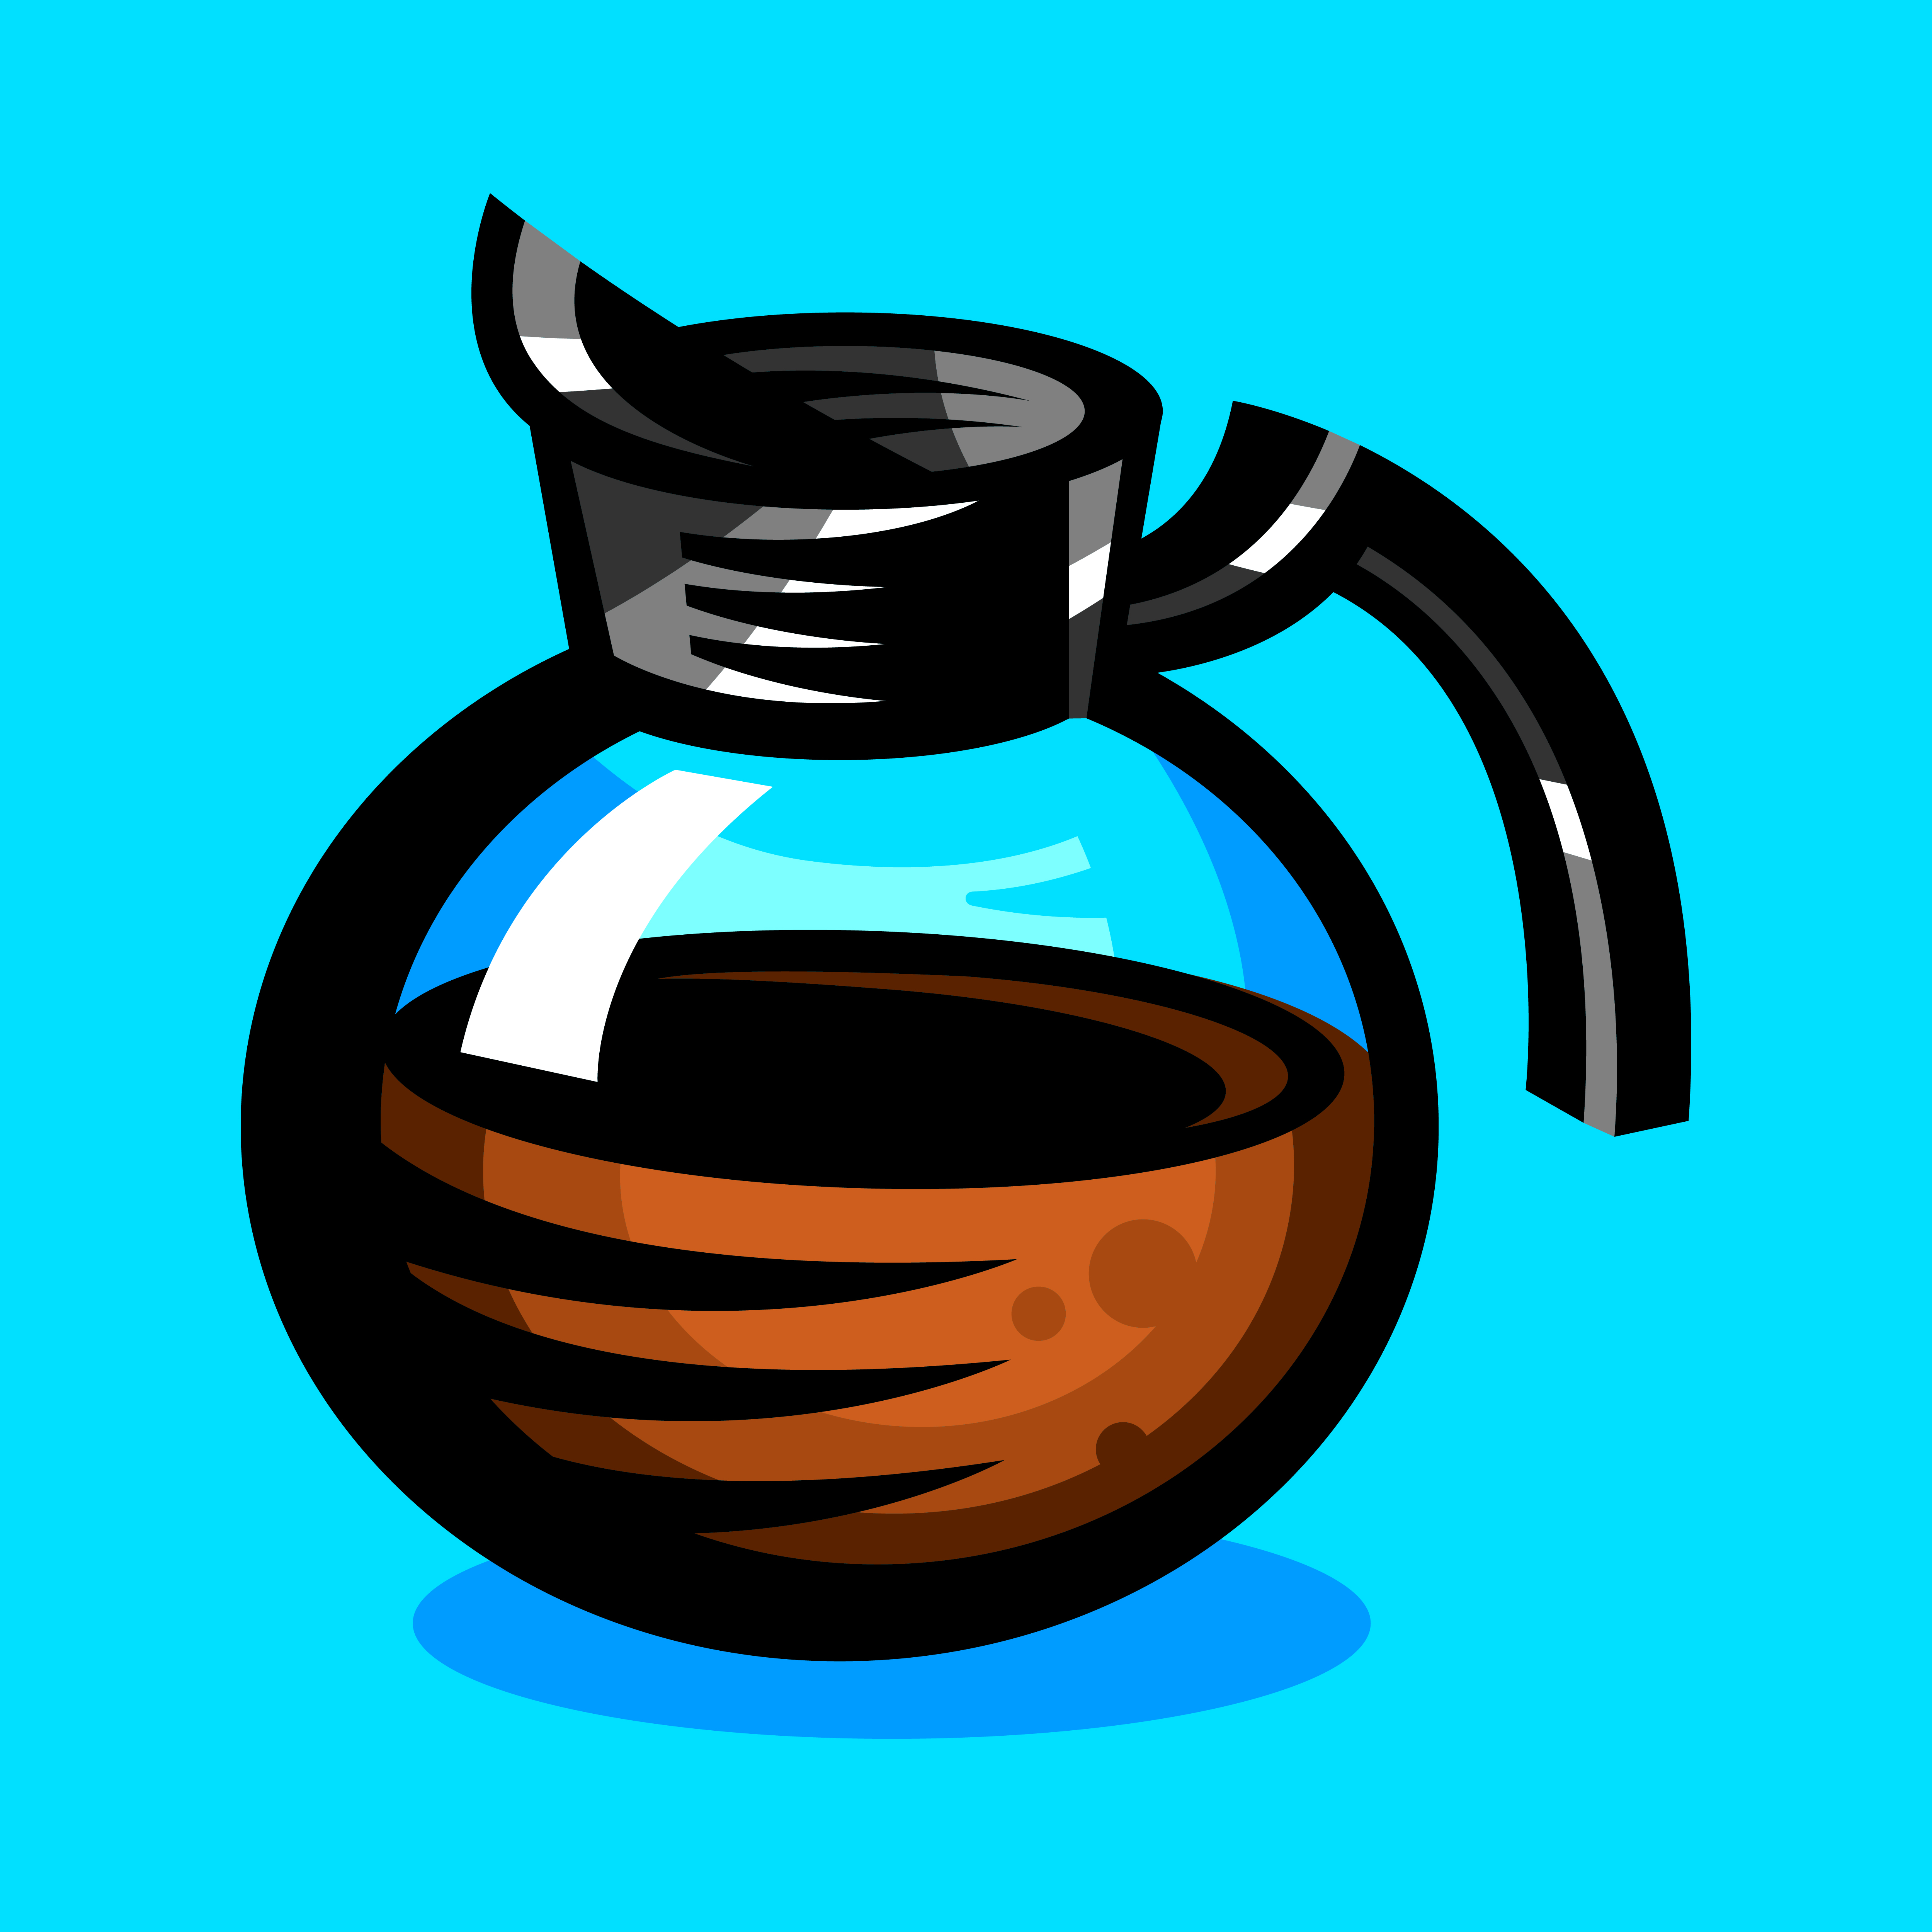 Coffee Pot Hot Drink Cartoon Illustration - Download Free ...